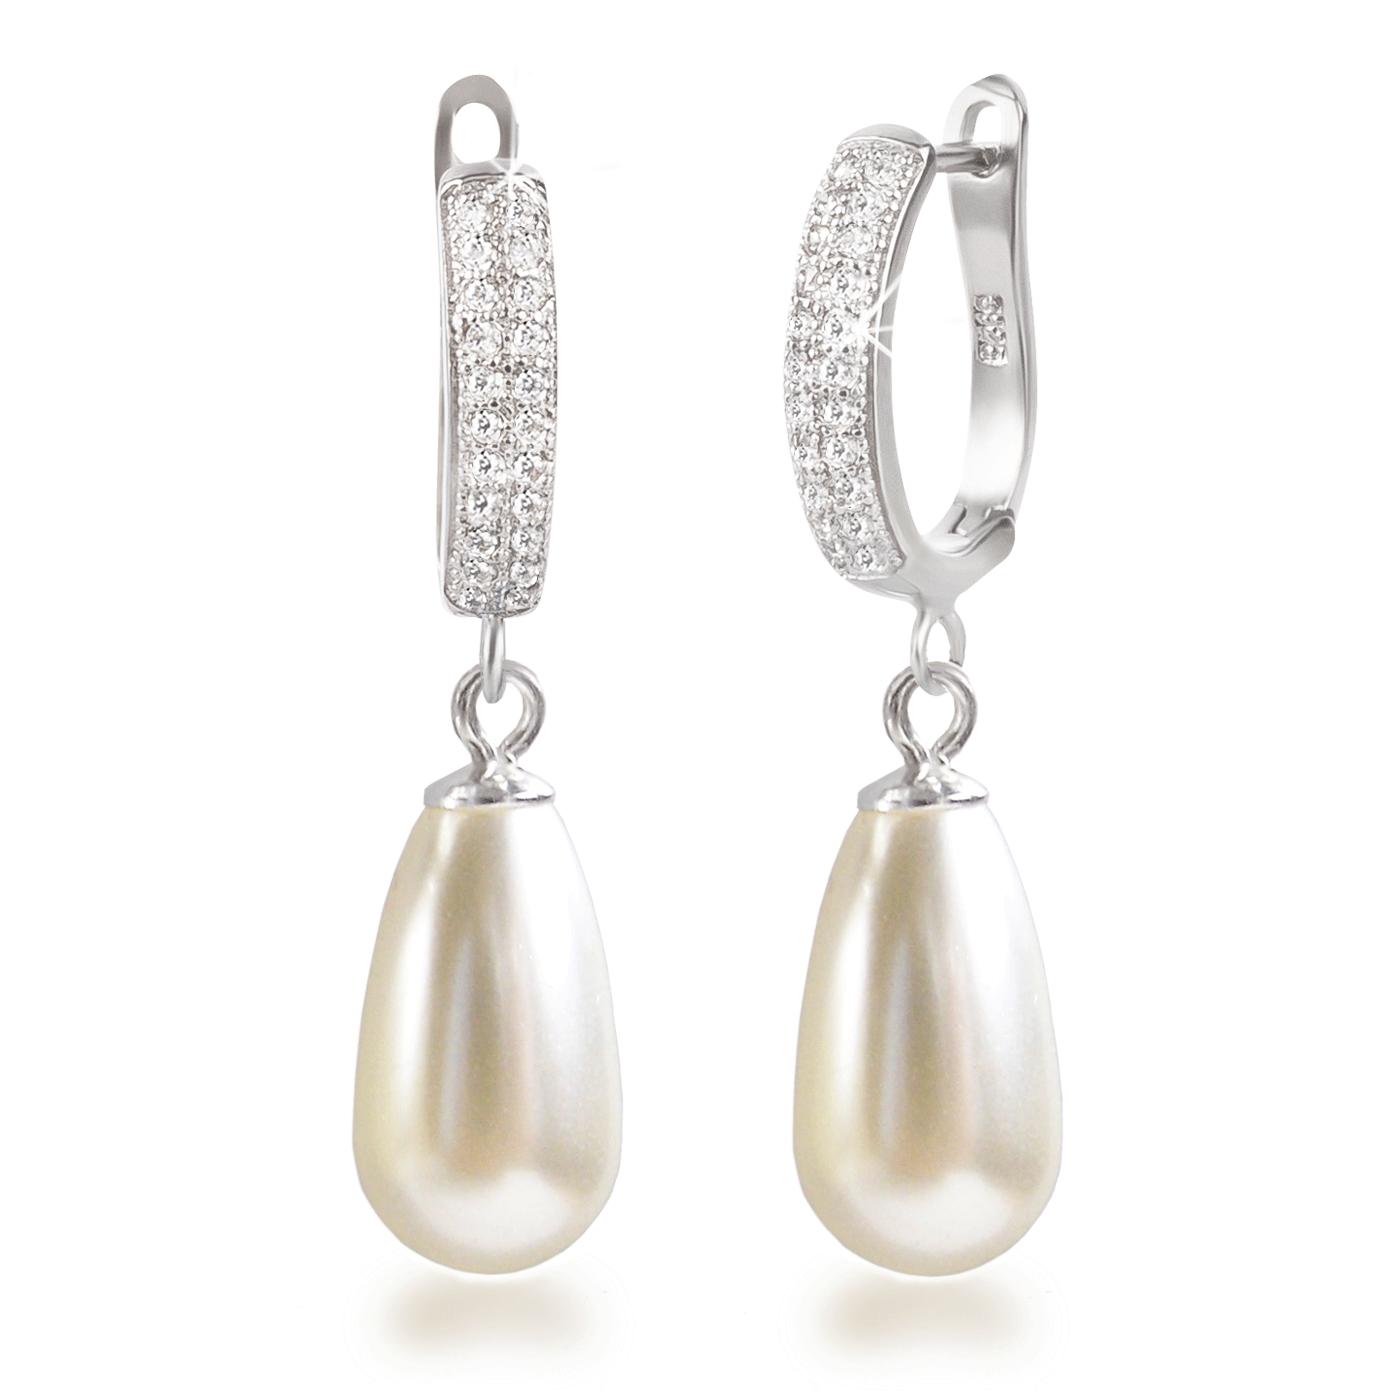 Perlenohrringe  Ohrhänger mit großen Tropfen Perlen cremeweiß, Perlenohrringe ...